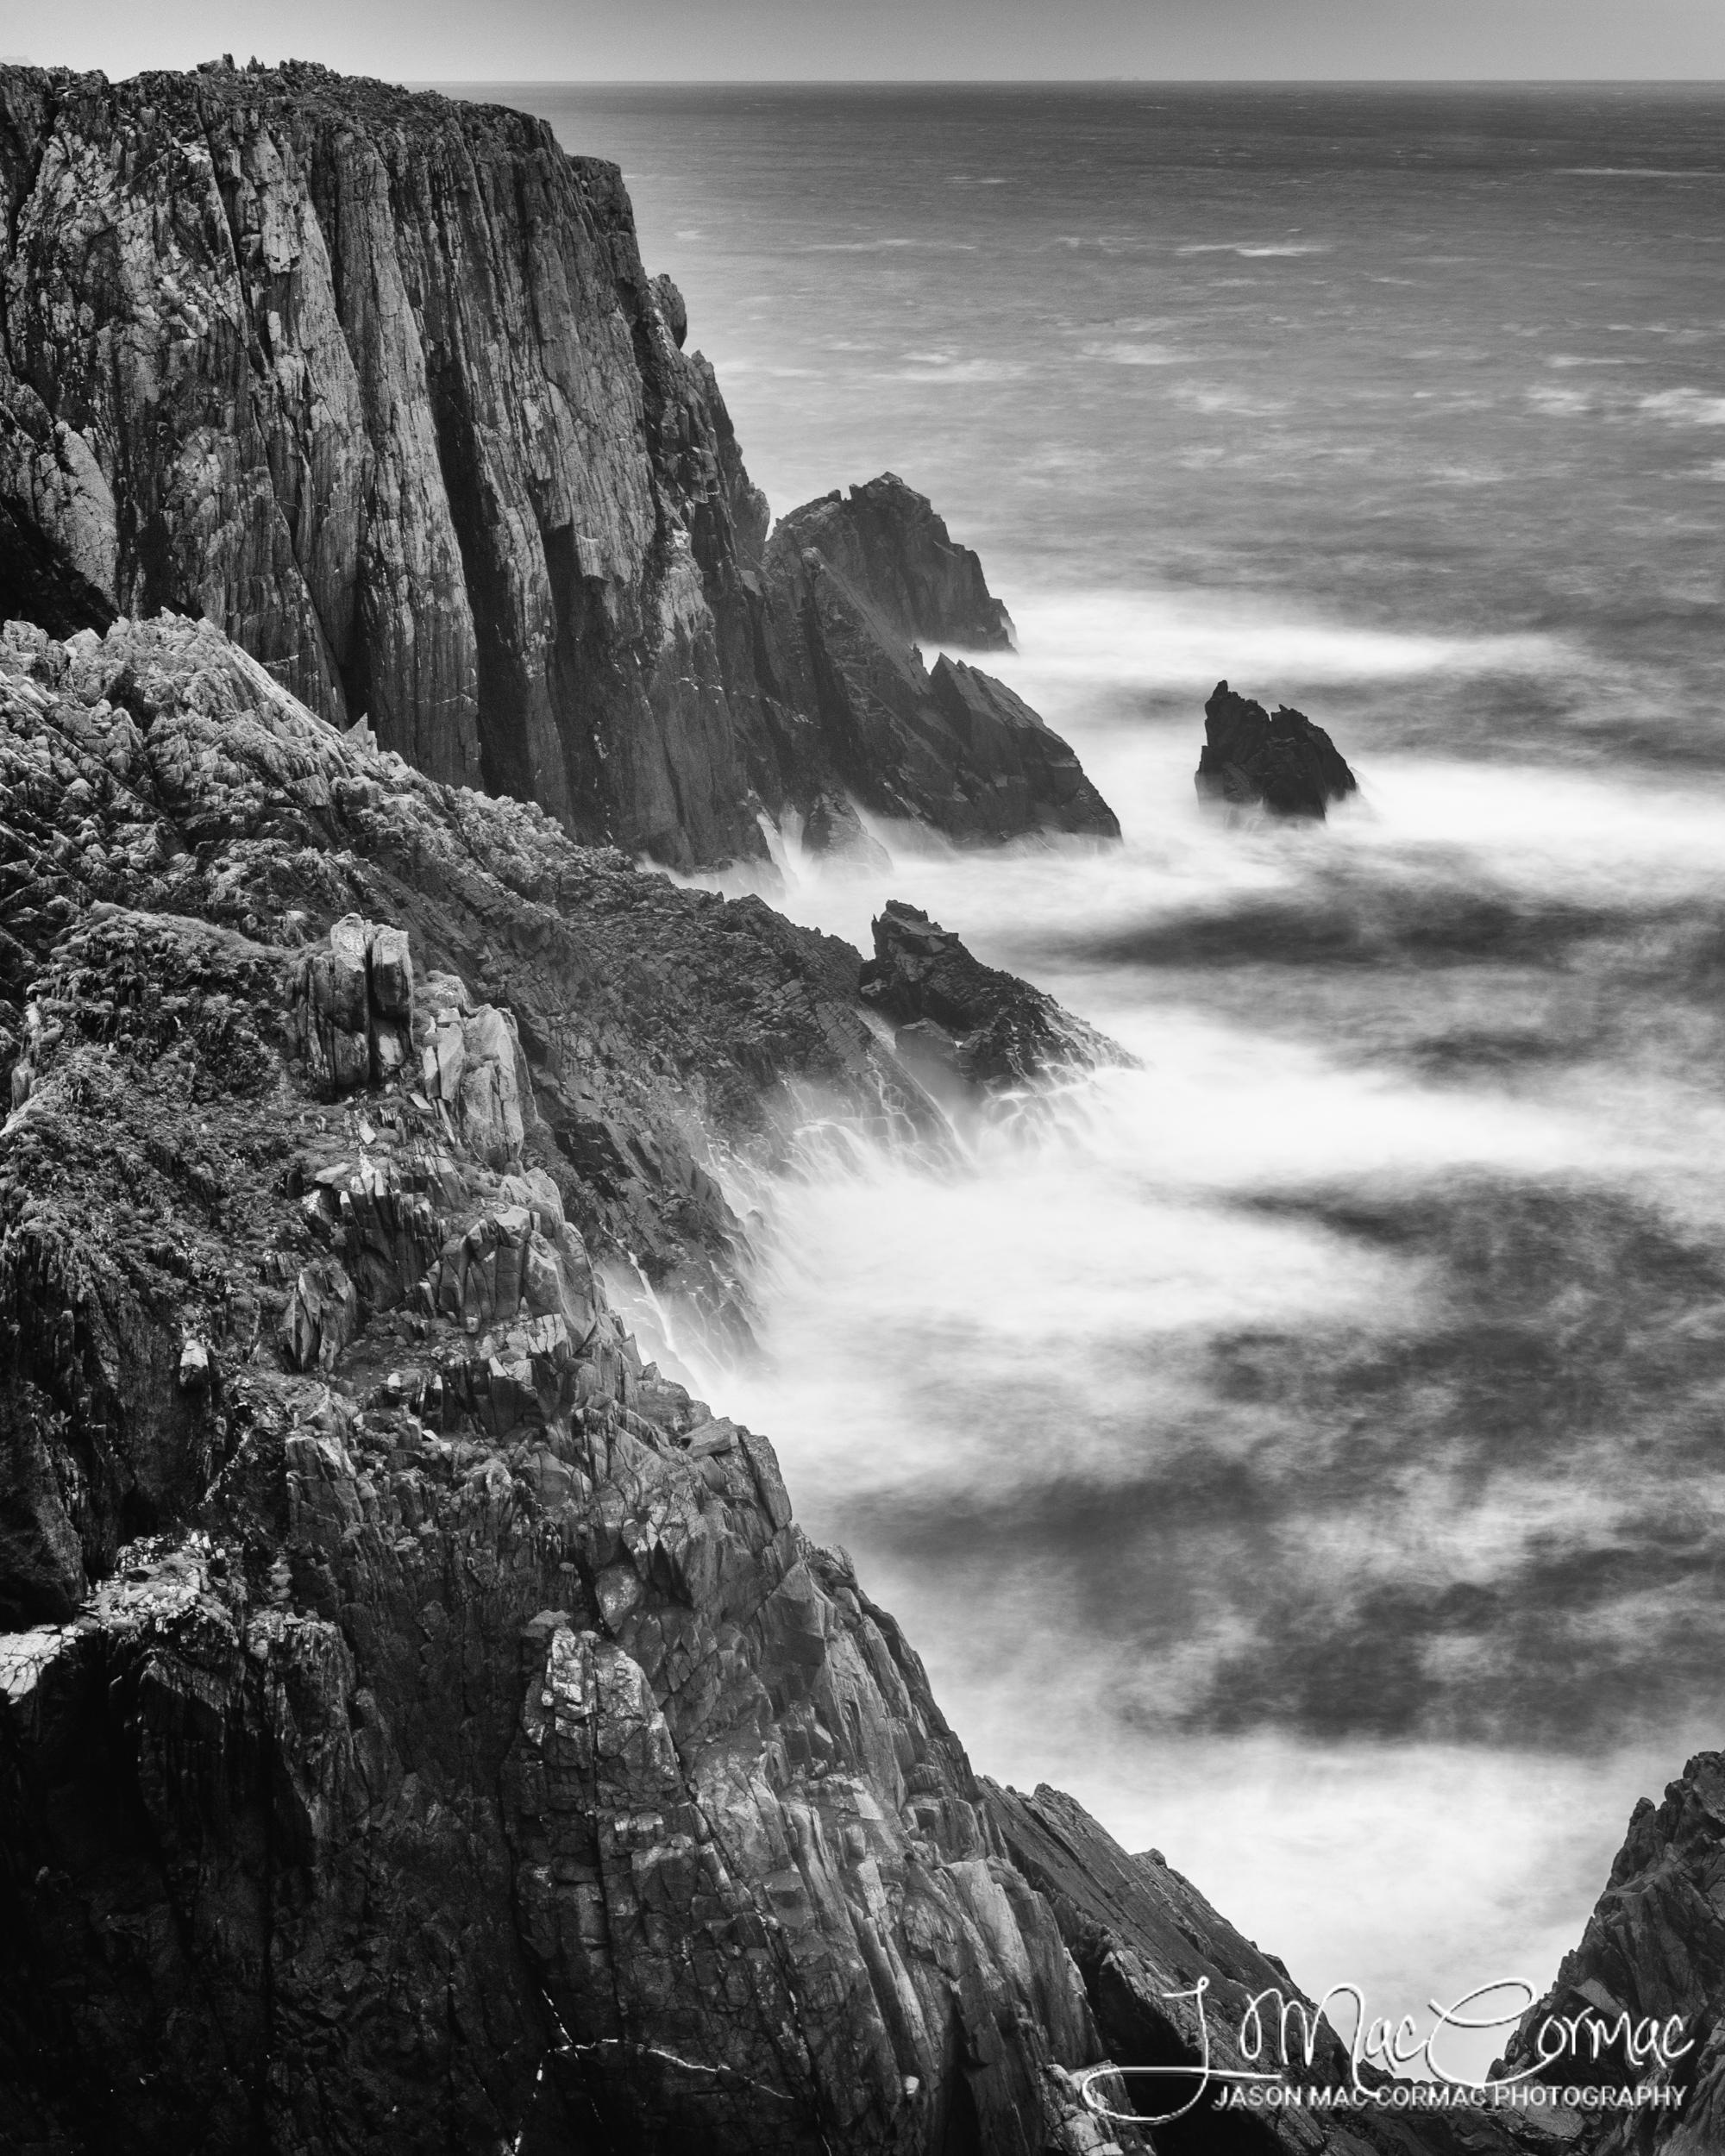 Malin Head cliffs, Donegal